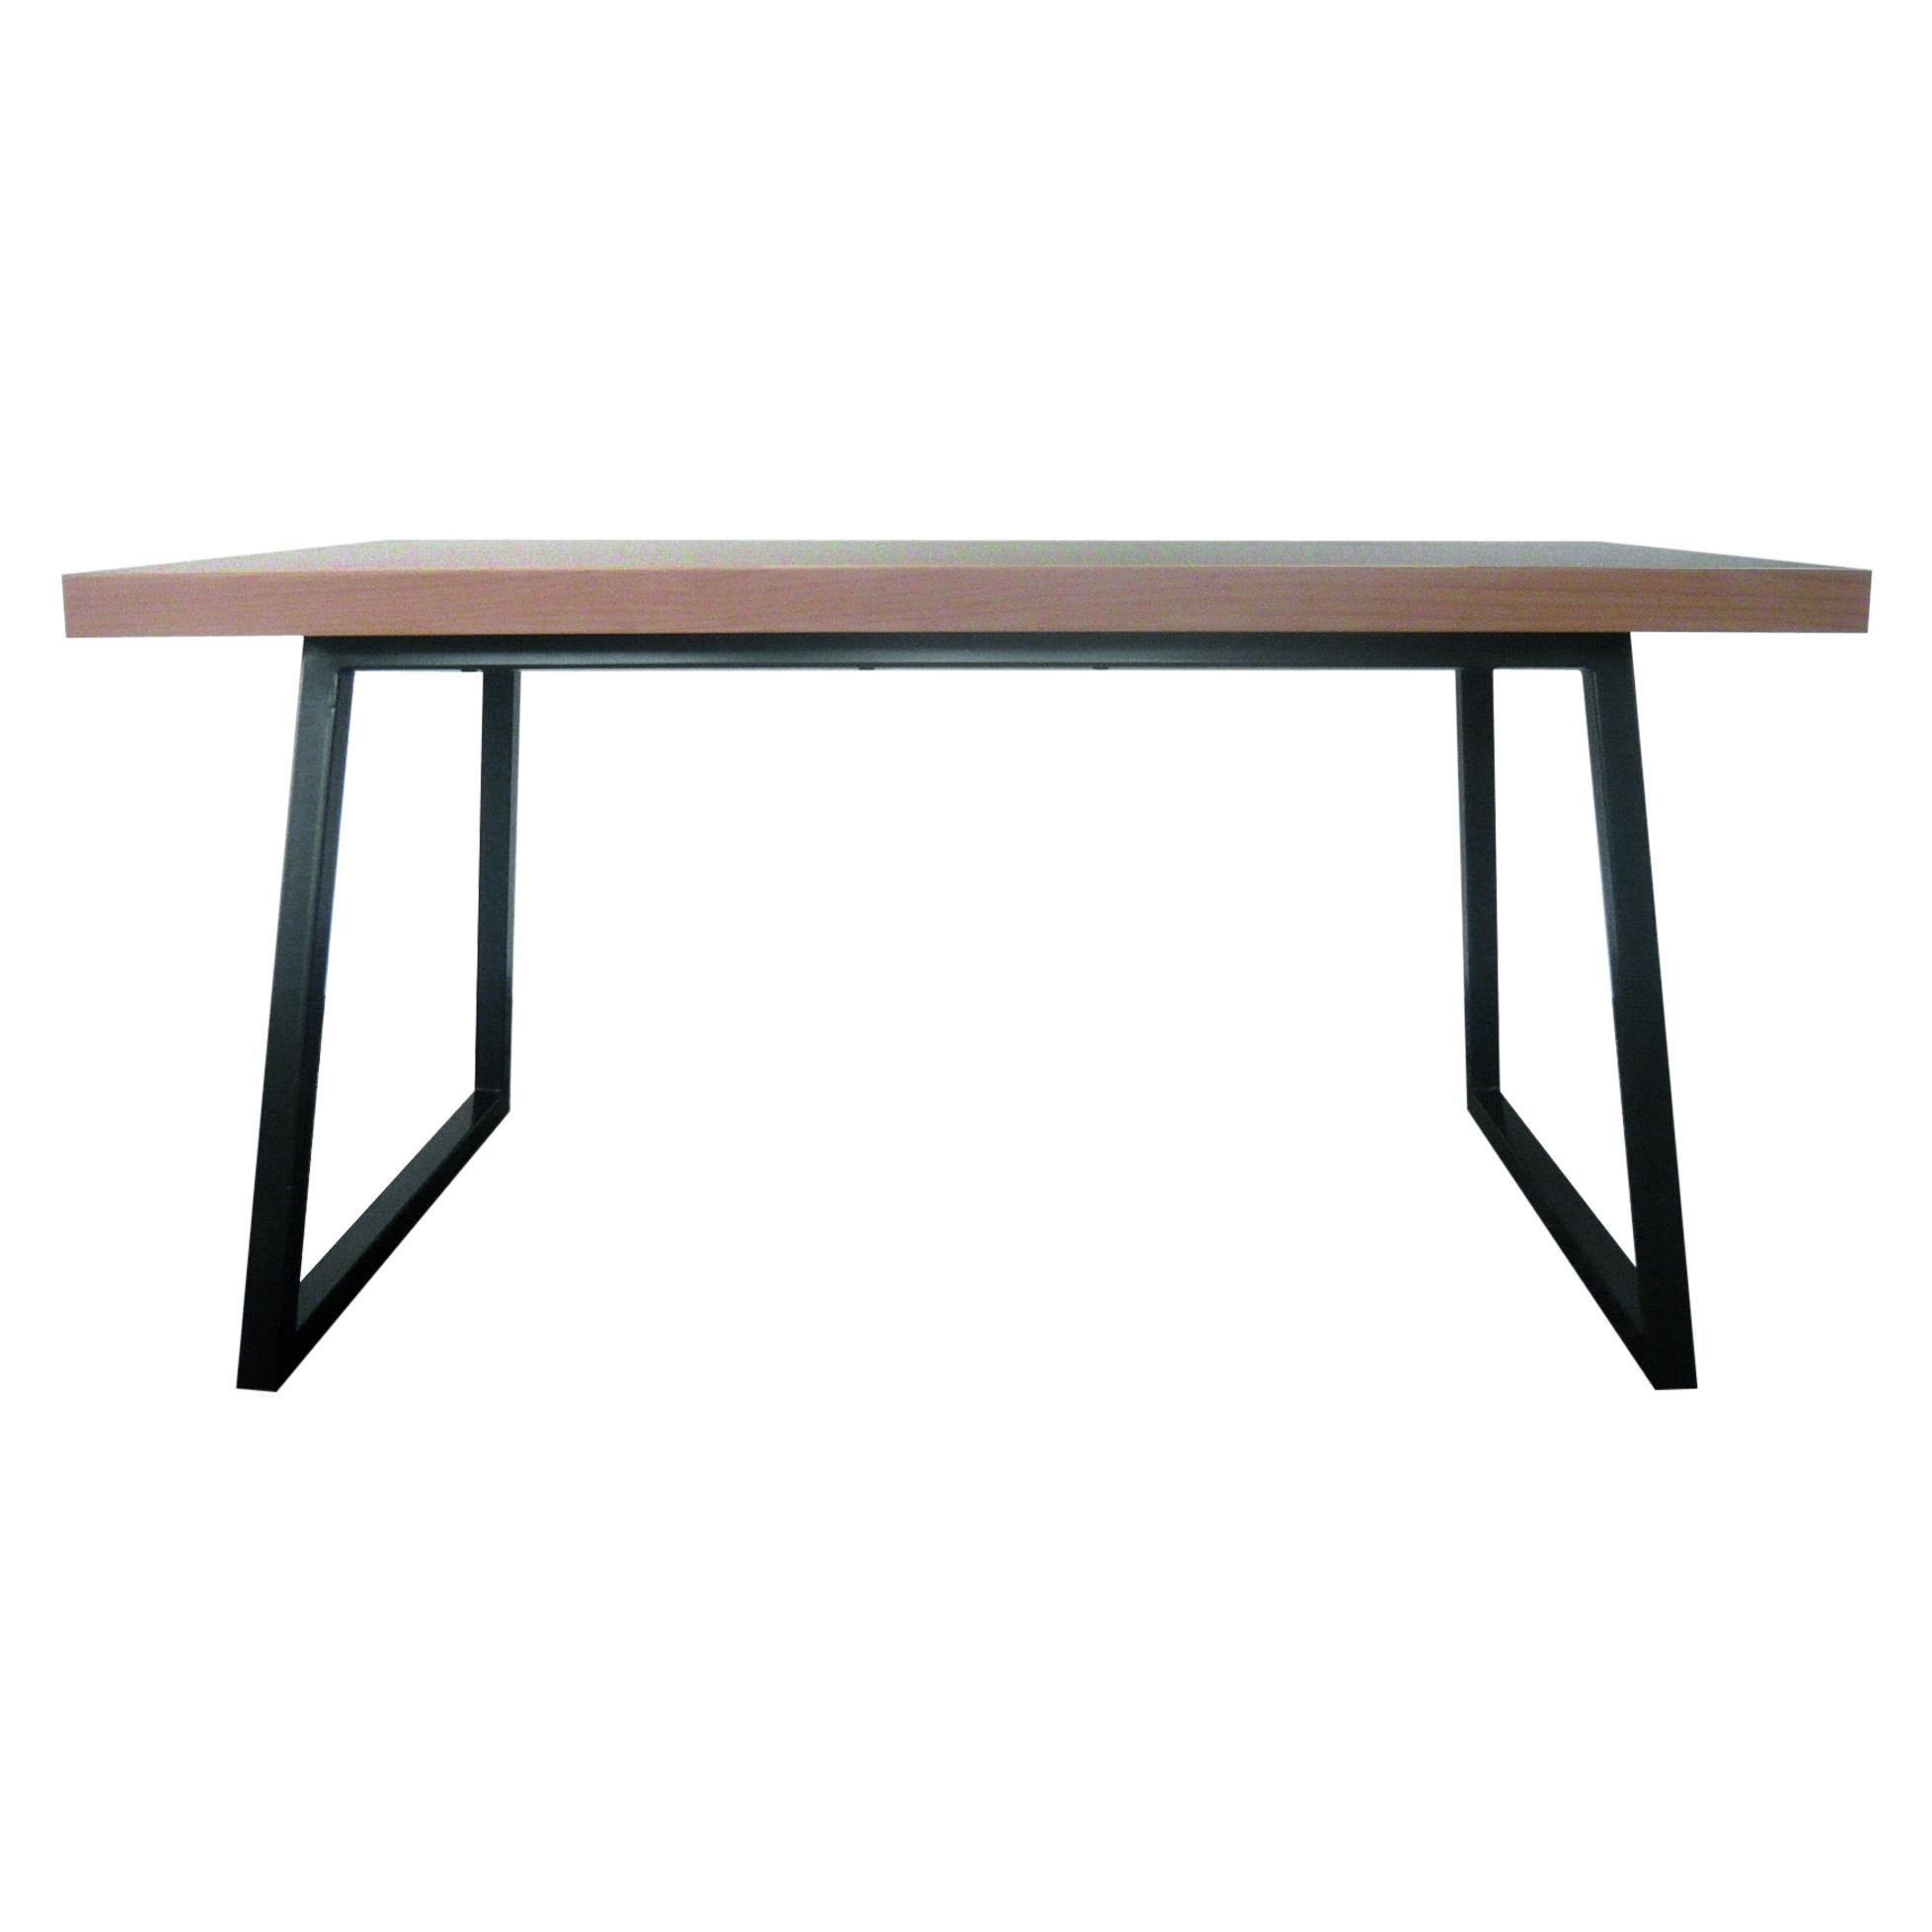 21st Century, Minimalist, European, Table of lined beechwood and Metal Base